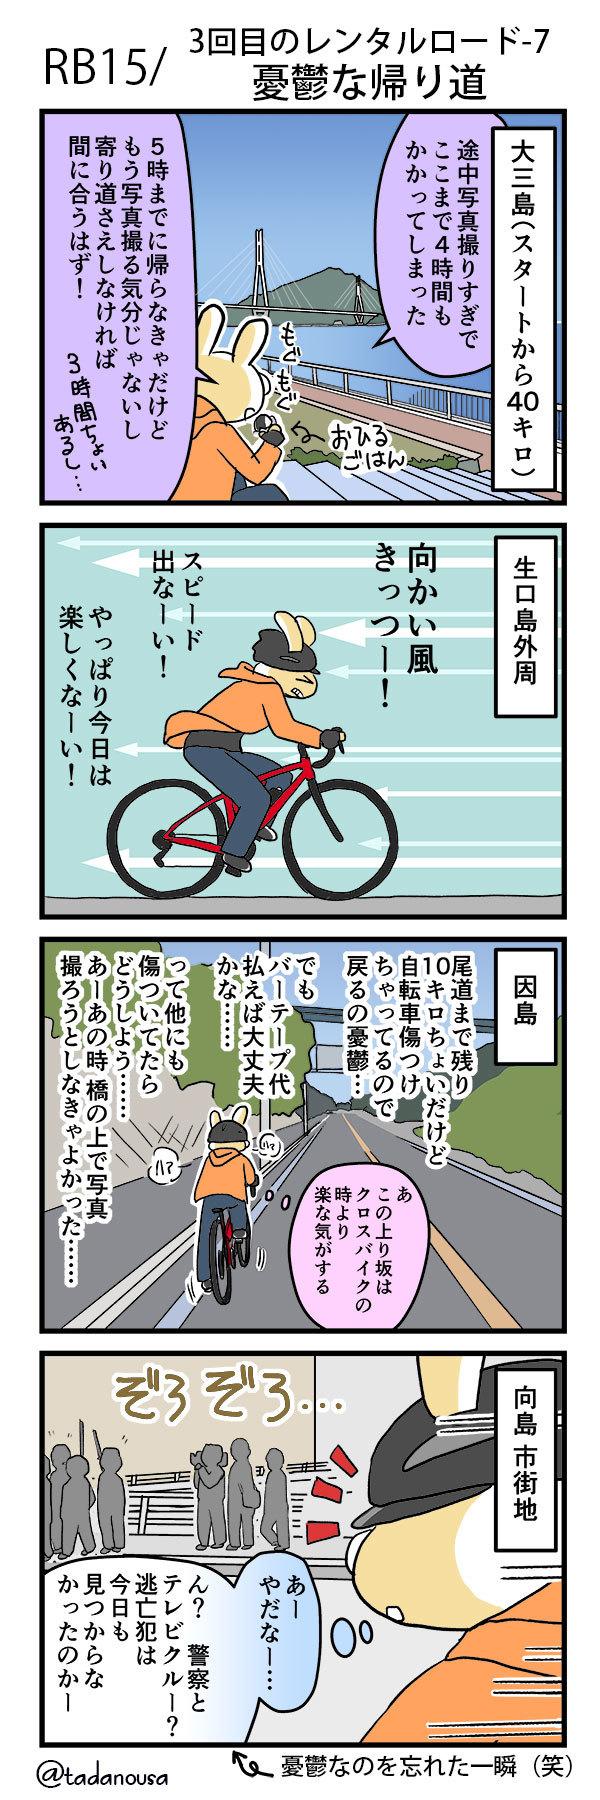 bike_4koma_road015_s.jpg